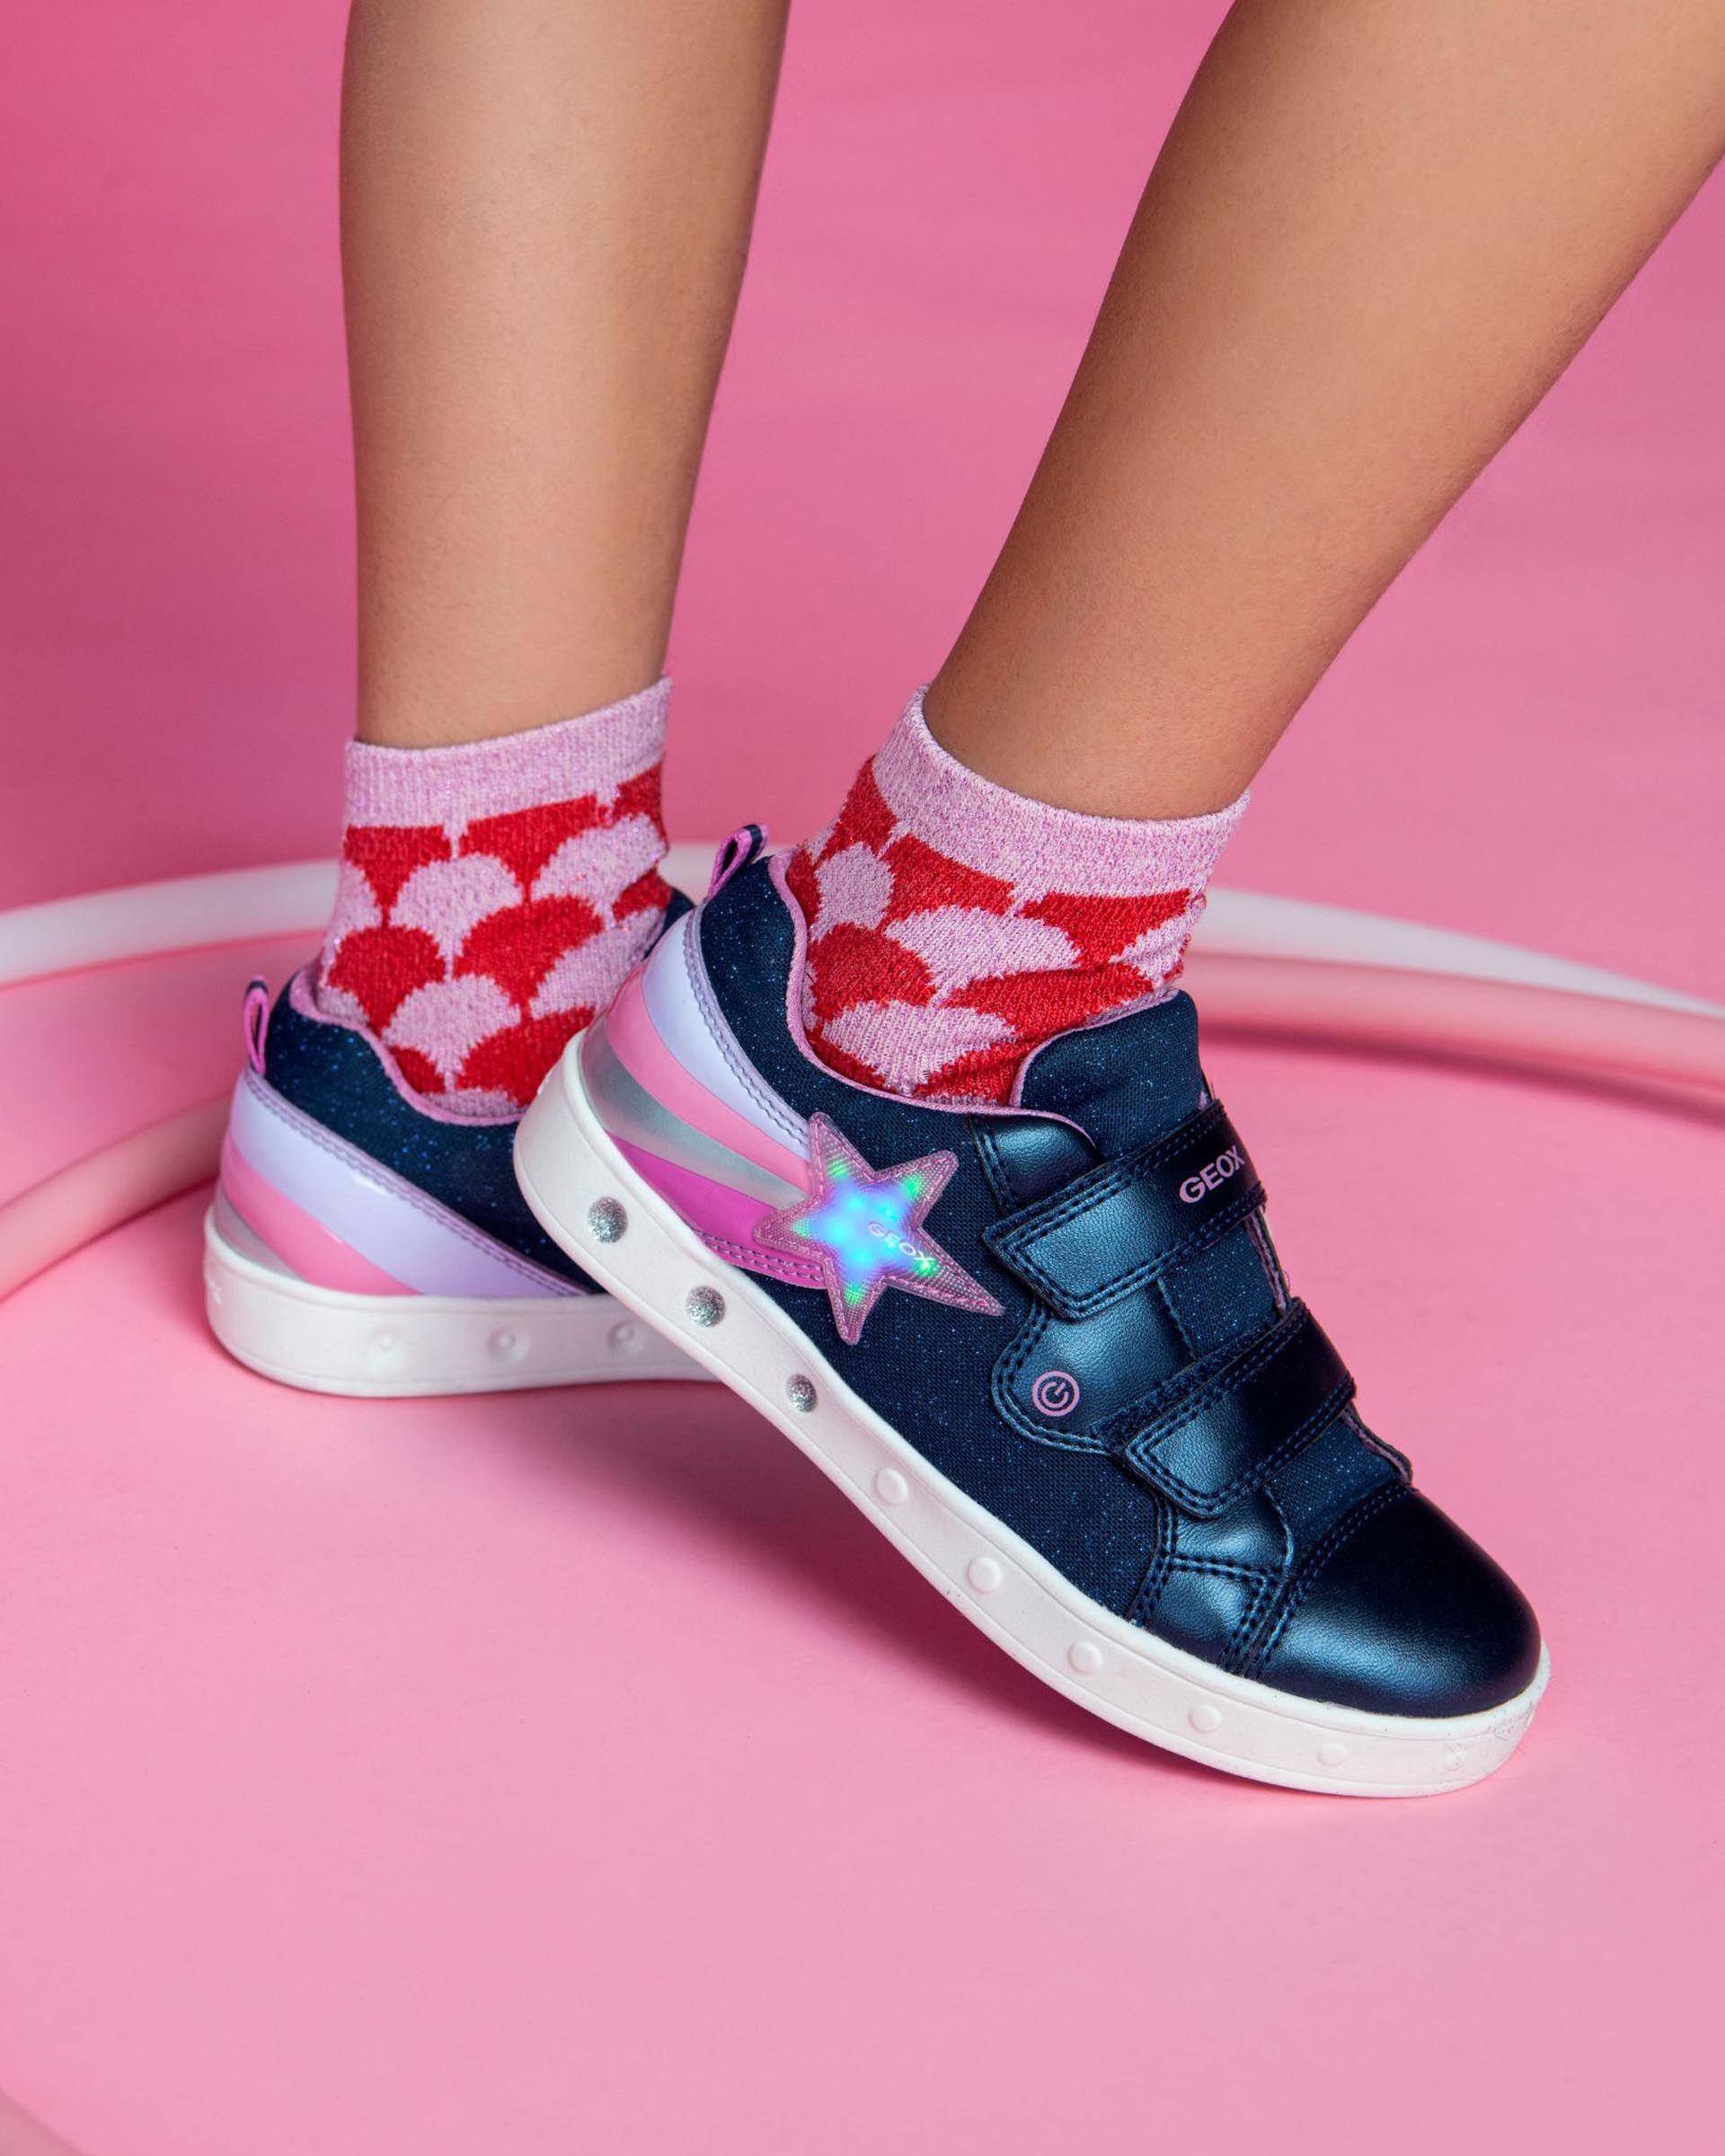 Geox SKYLIN Junior Girl: Navy blue